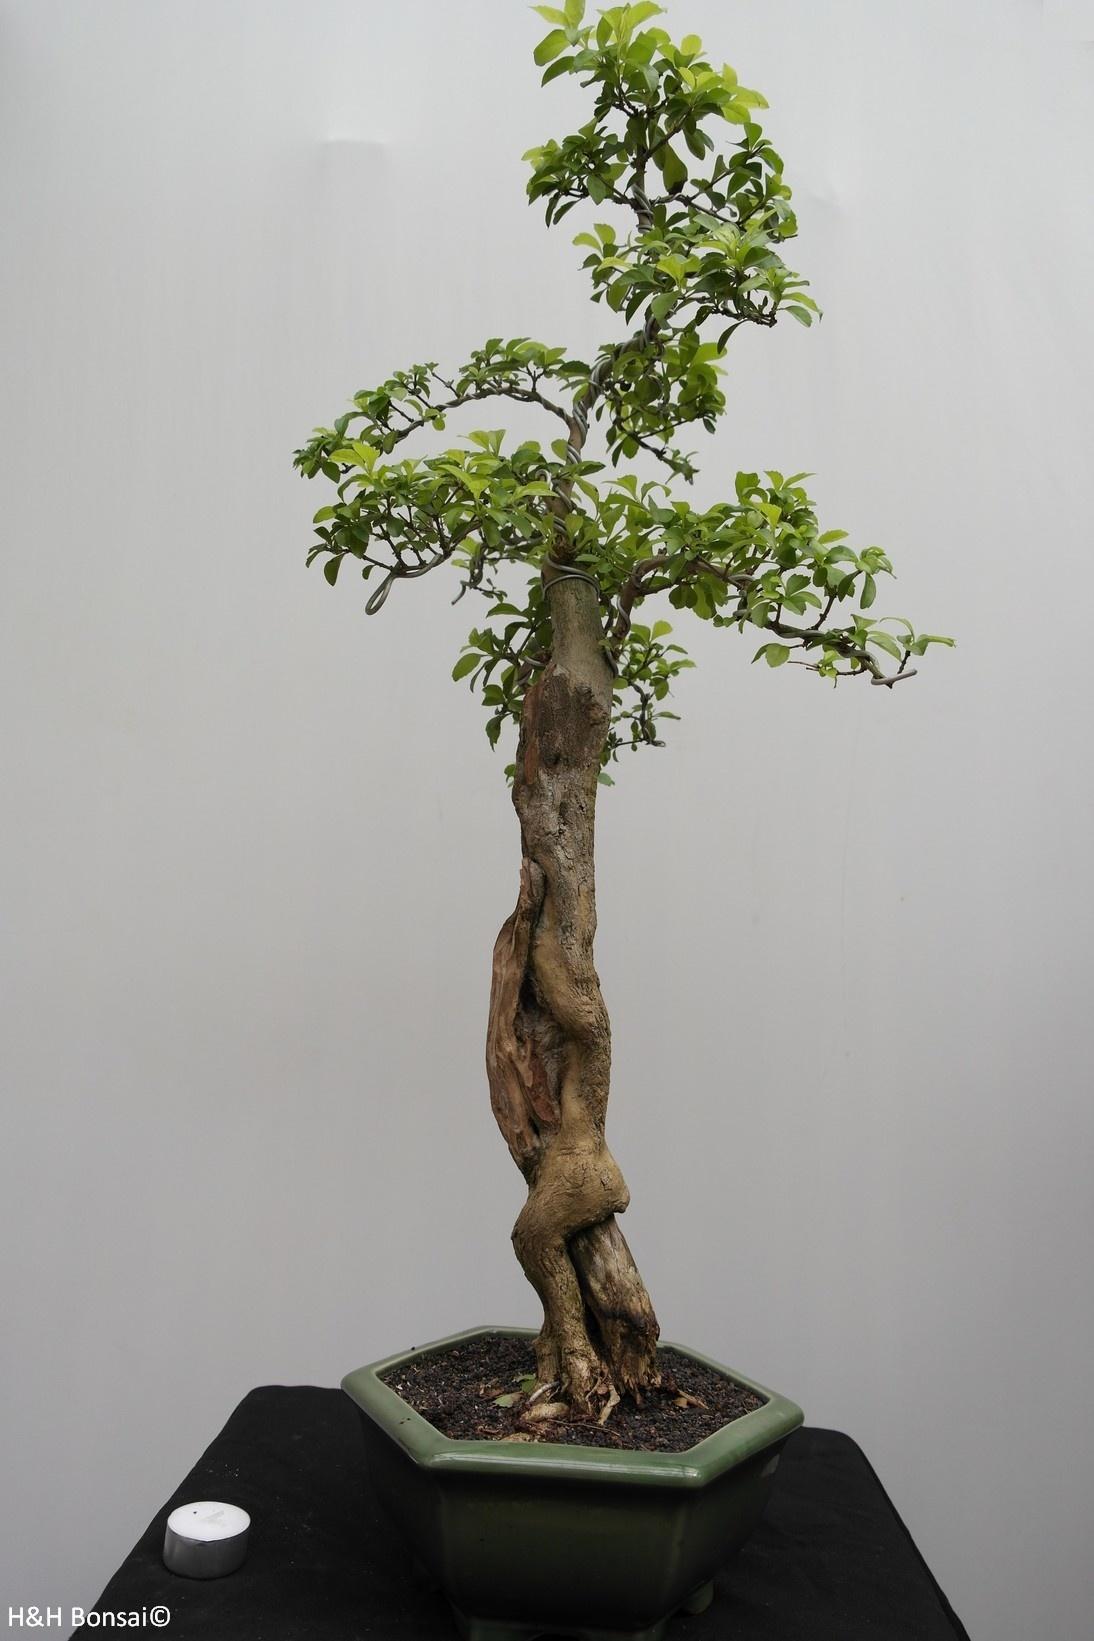 Bonsai Duranta, no. 7836